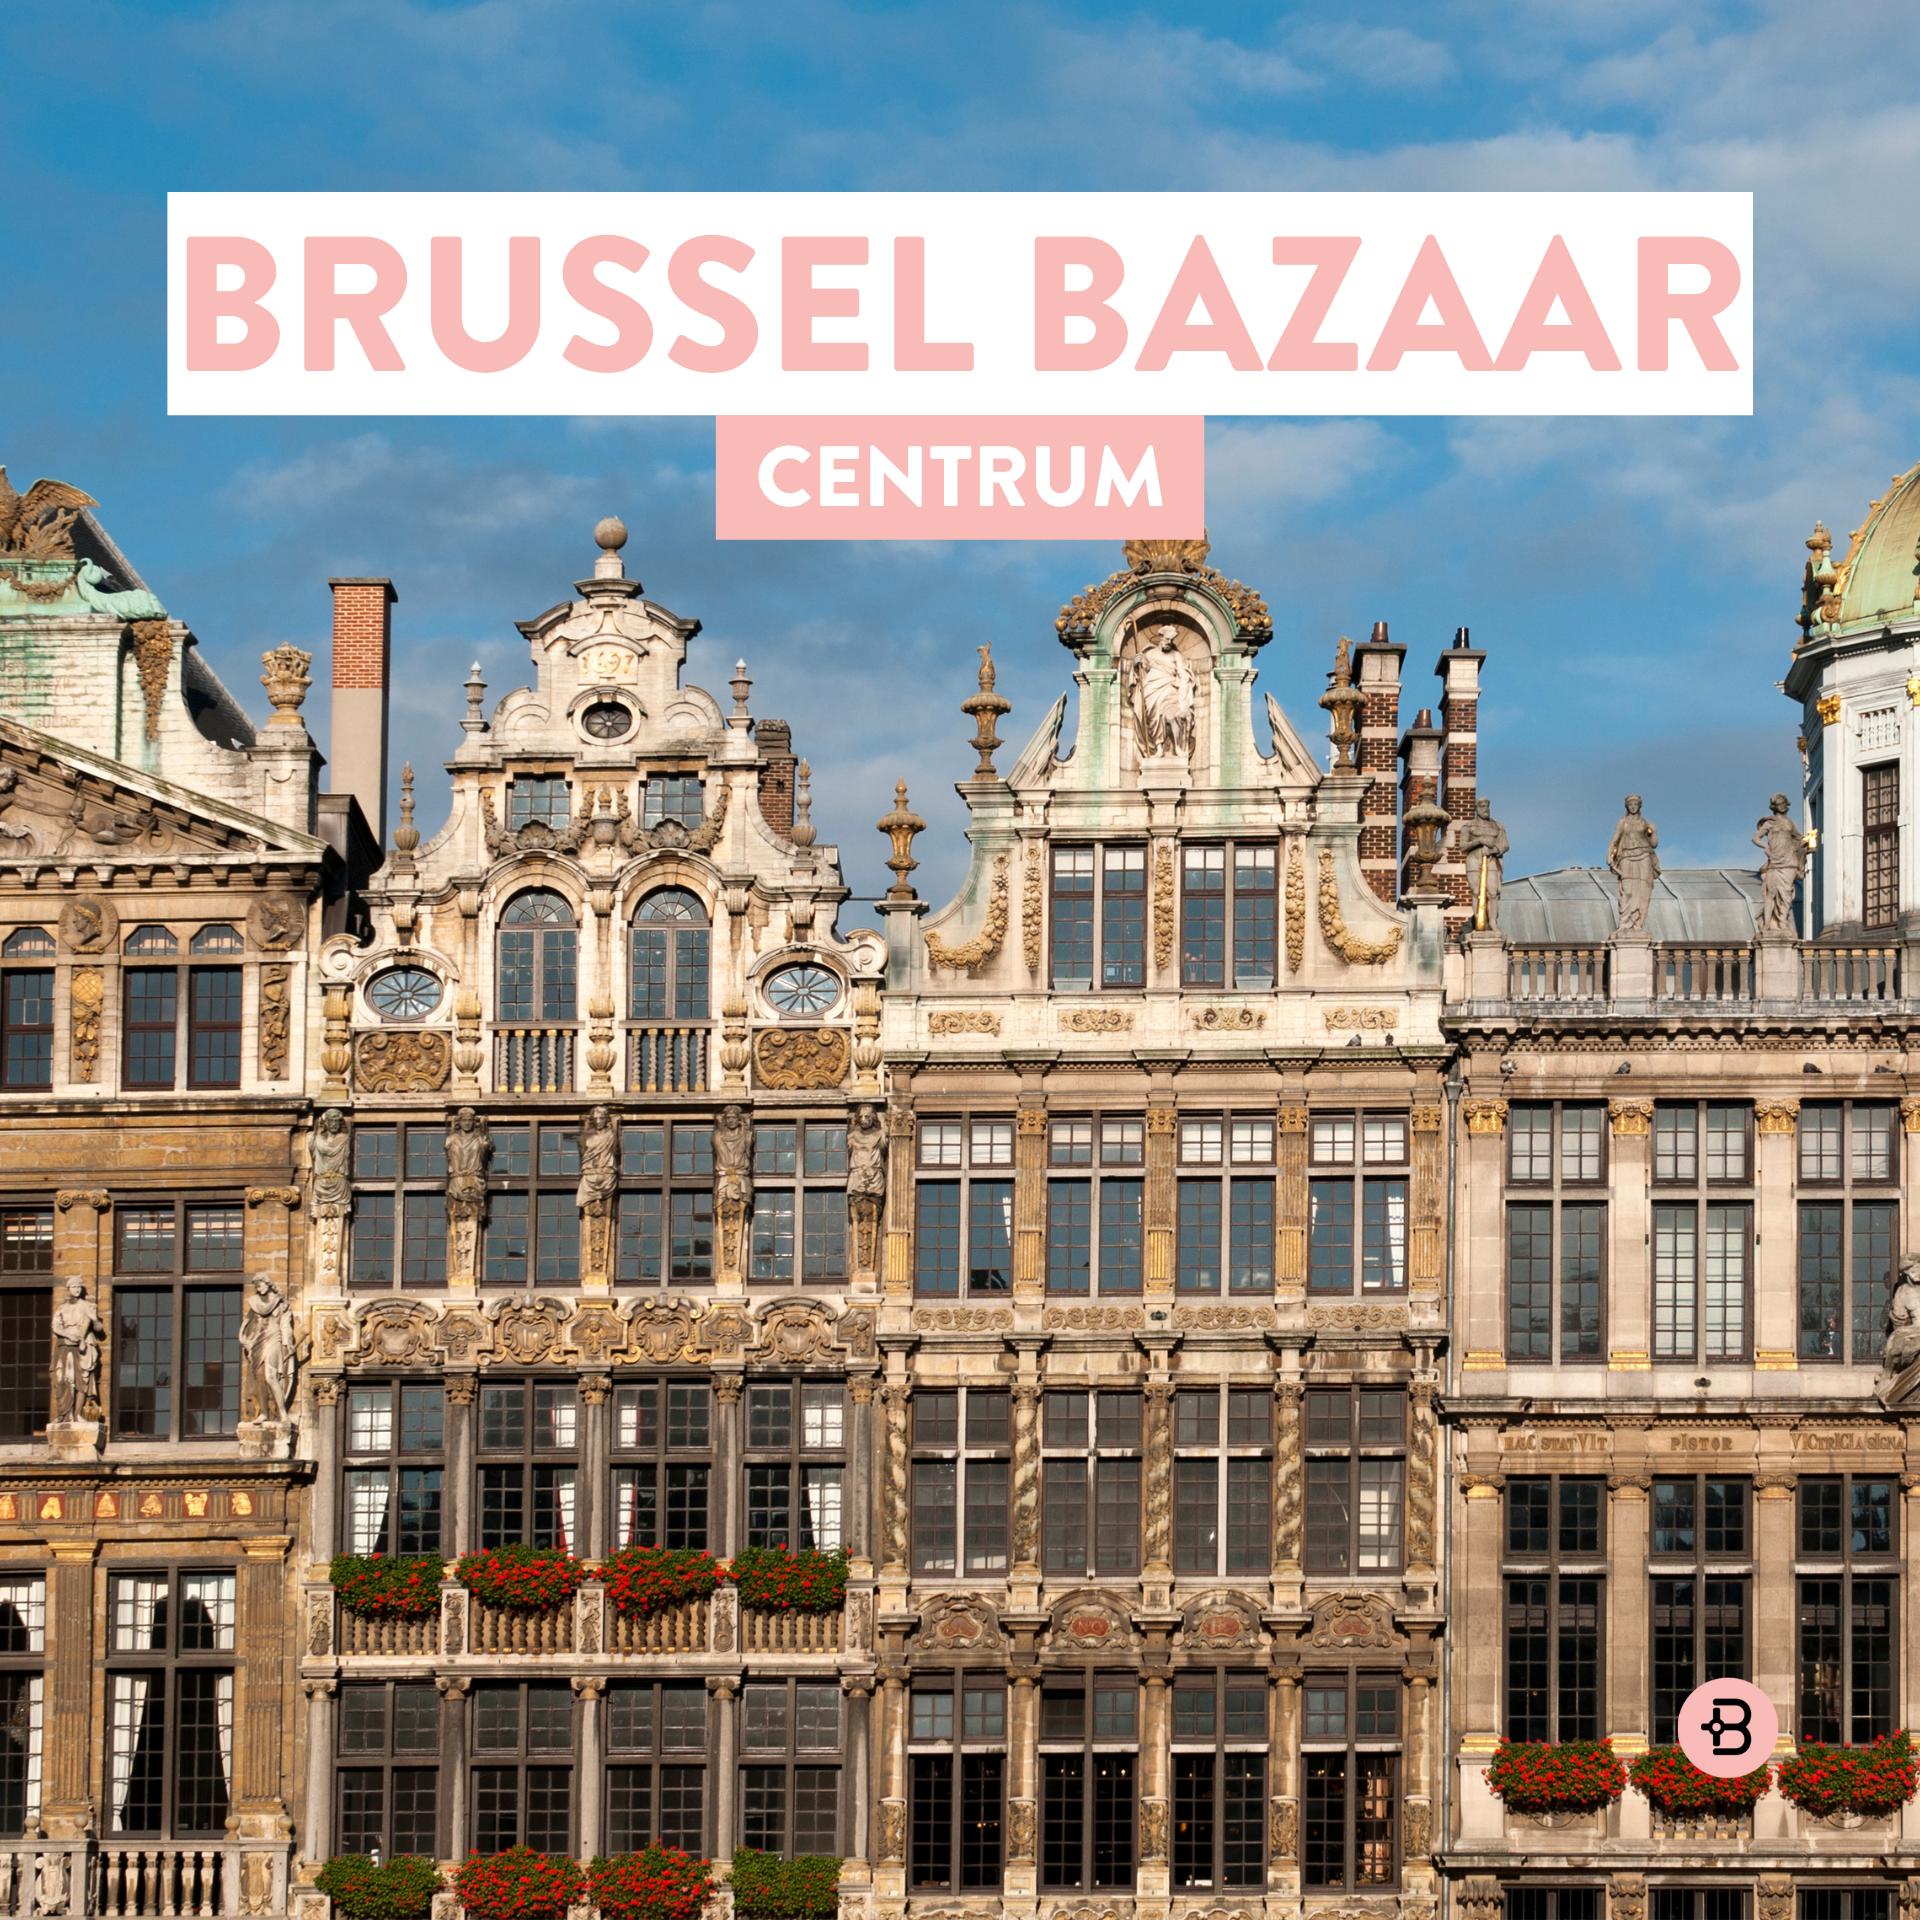 BRUSSEL BAZAAR | Centrum